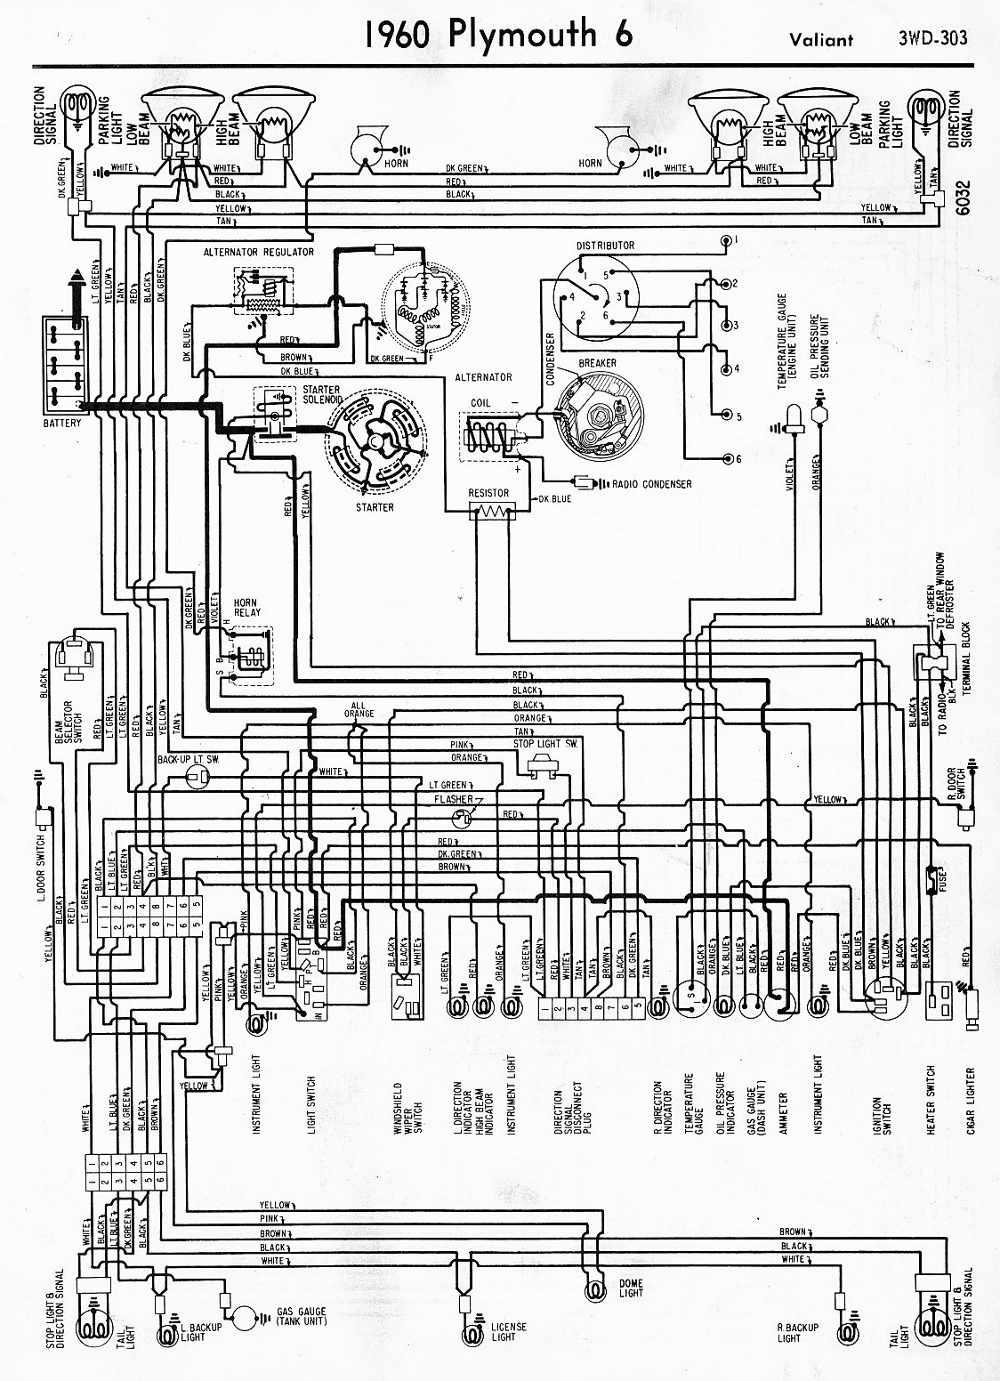 1968 Plymouth Barracuda Wiring Diagram Excellent Electrical Gtx For Roadrunner Library Rh 69 Mac Happen De 68 Camaro Dash